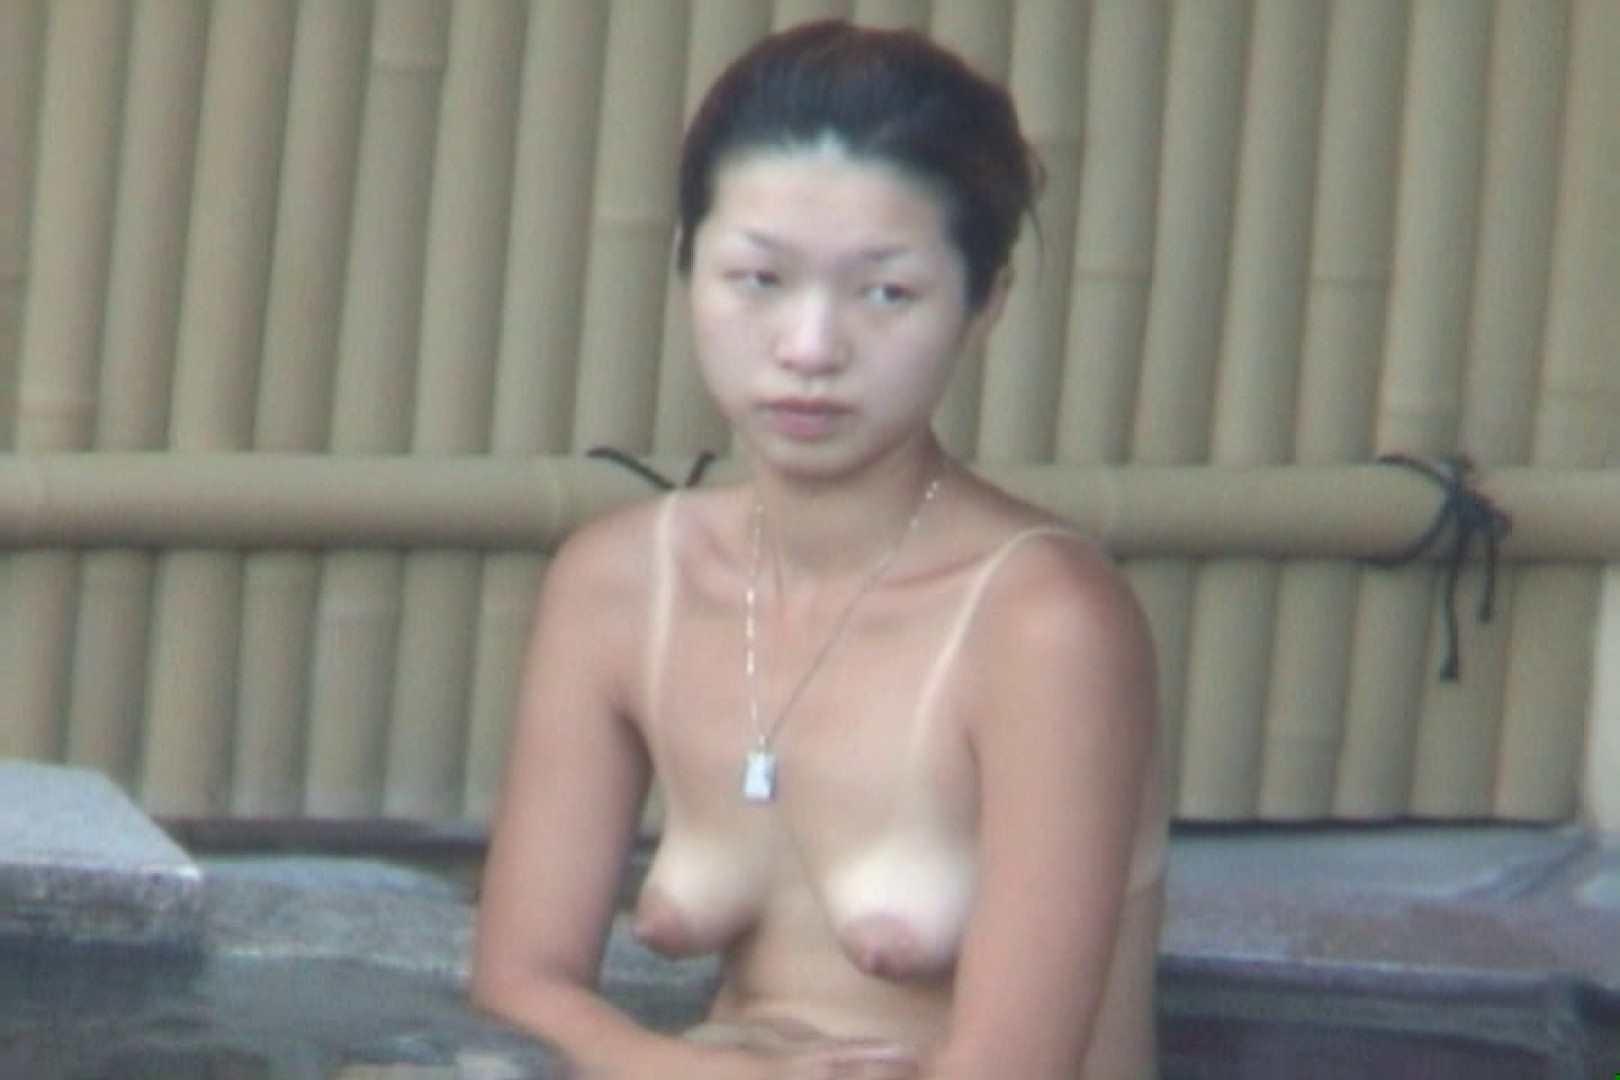 Aquaな露天風呂Vol.571 盗撮 | OLセックス  83画像 52